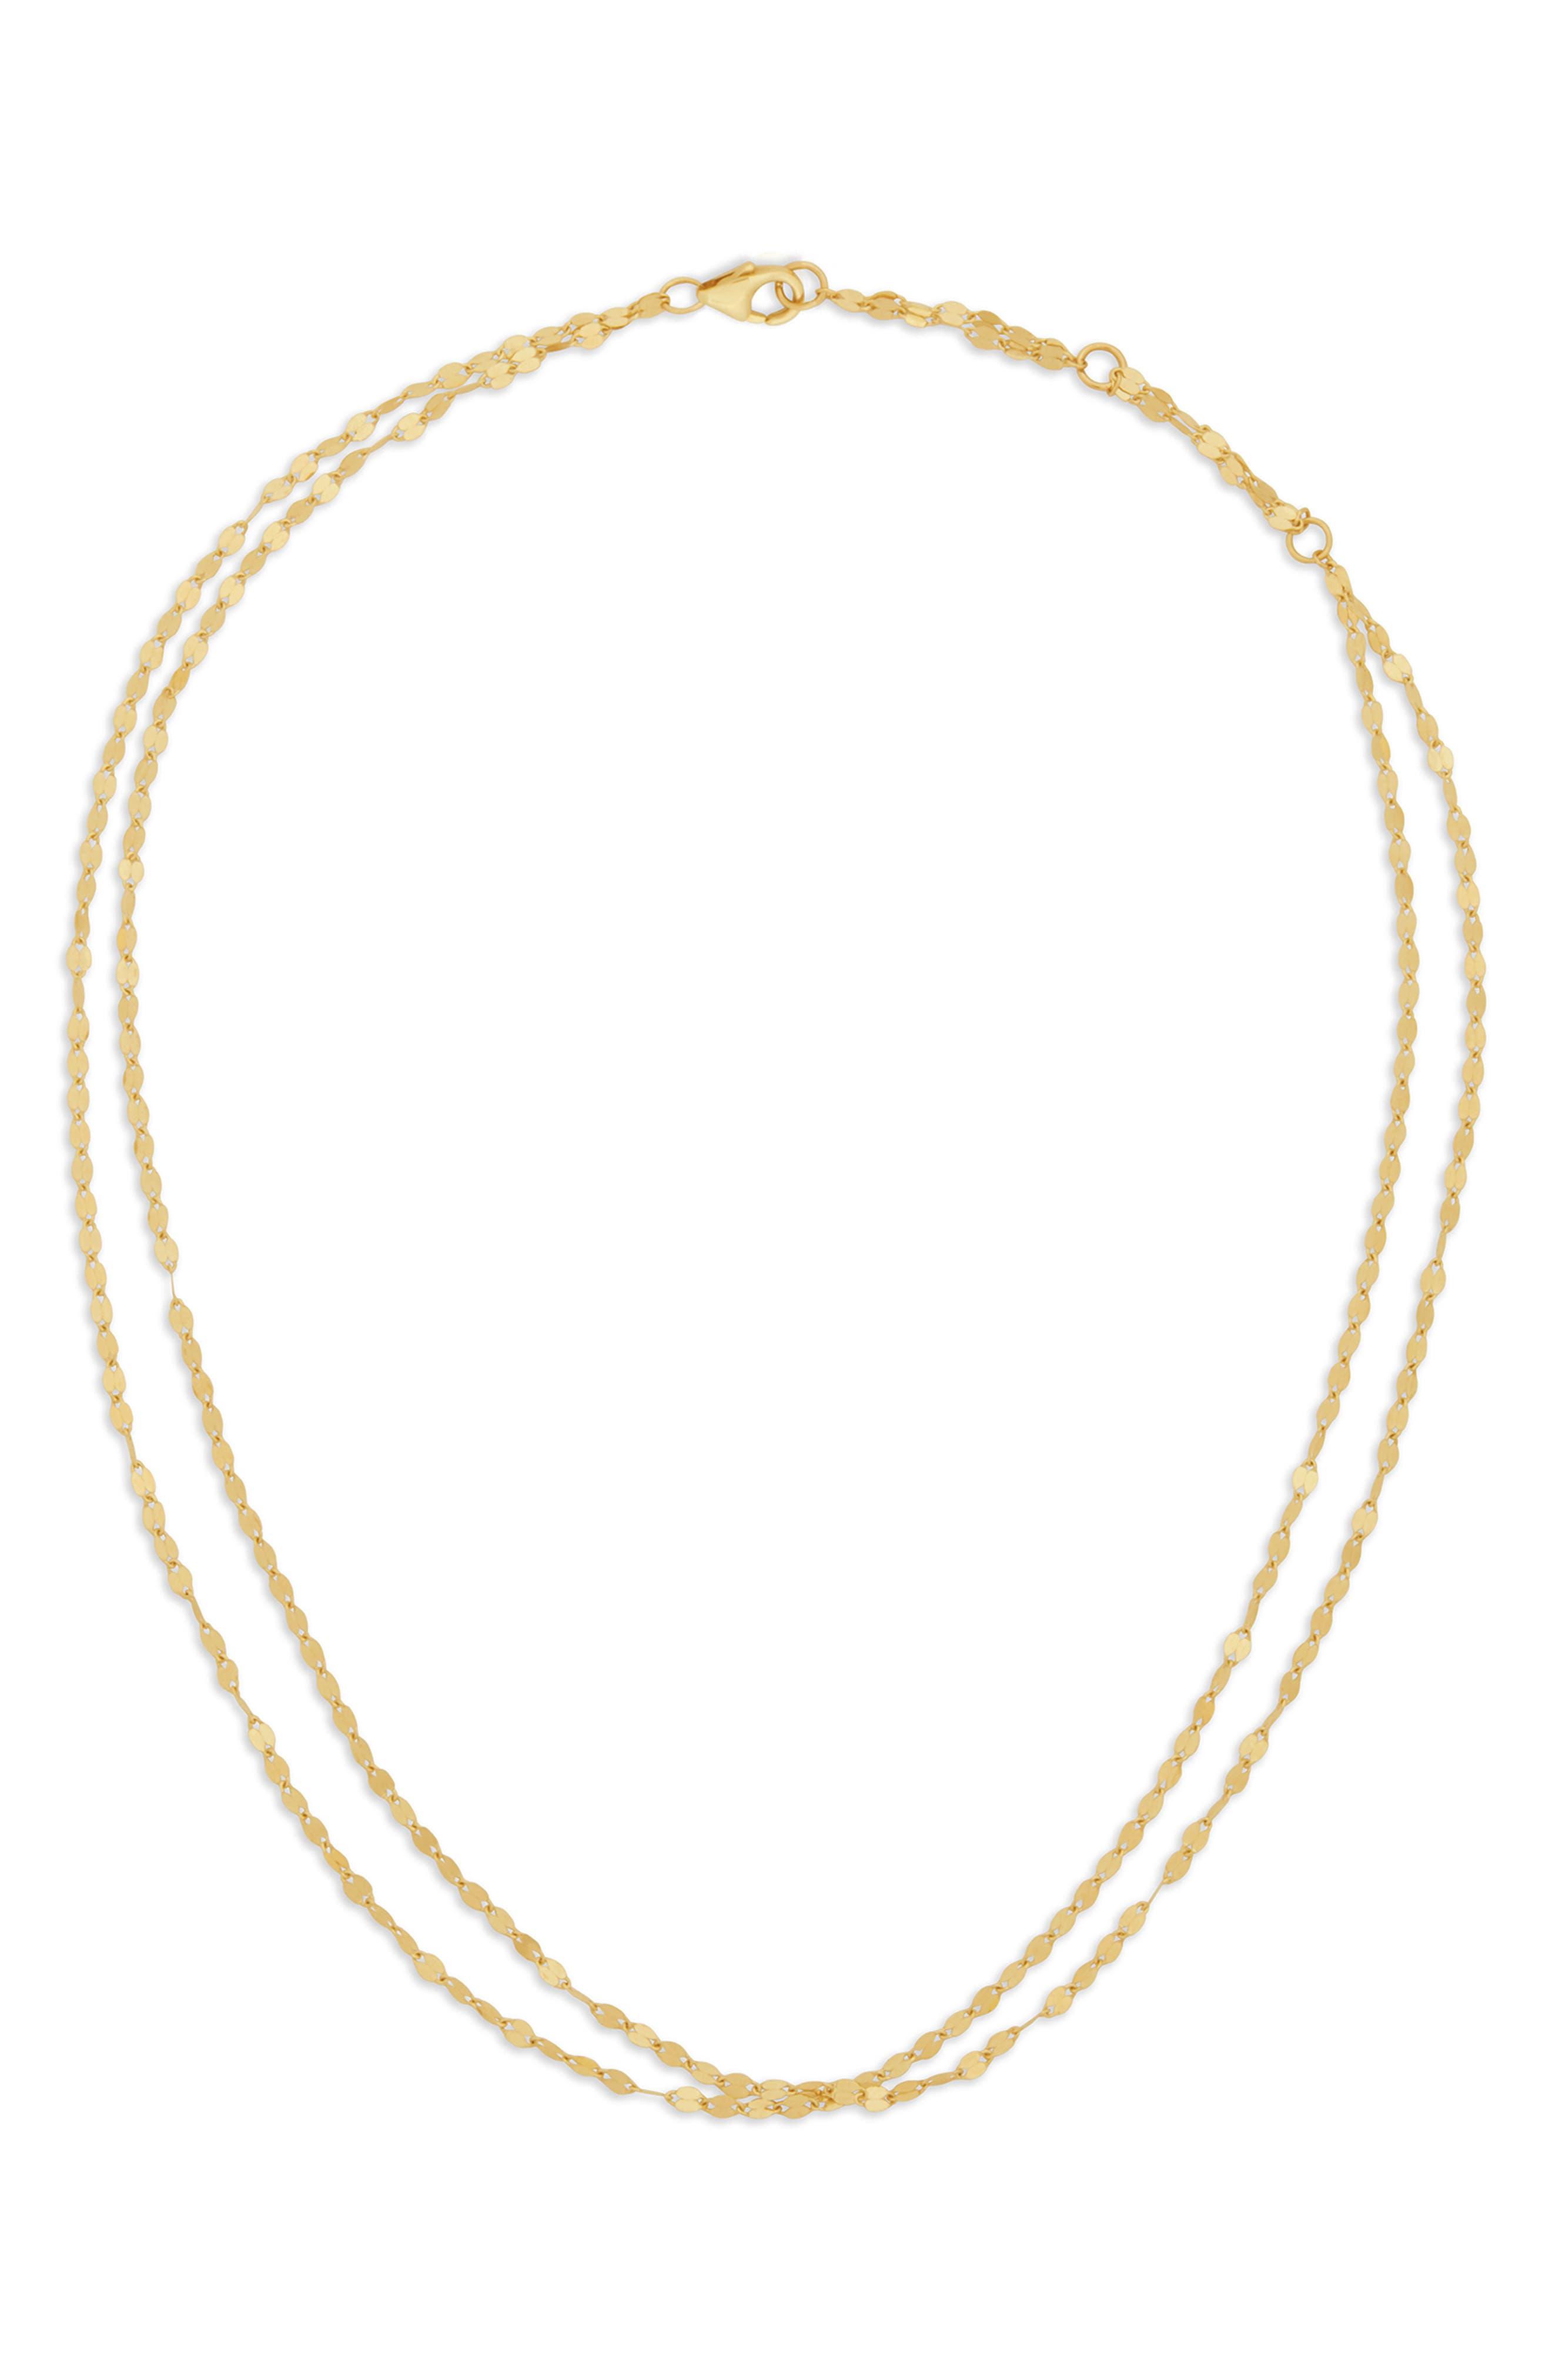 Gemstone Choker Birthday Gift For Her Chic Fashion Accessories Gemstone Necklace Aquamarine Labradorite White Pearl Gold Pyrite Necklace